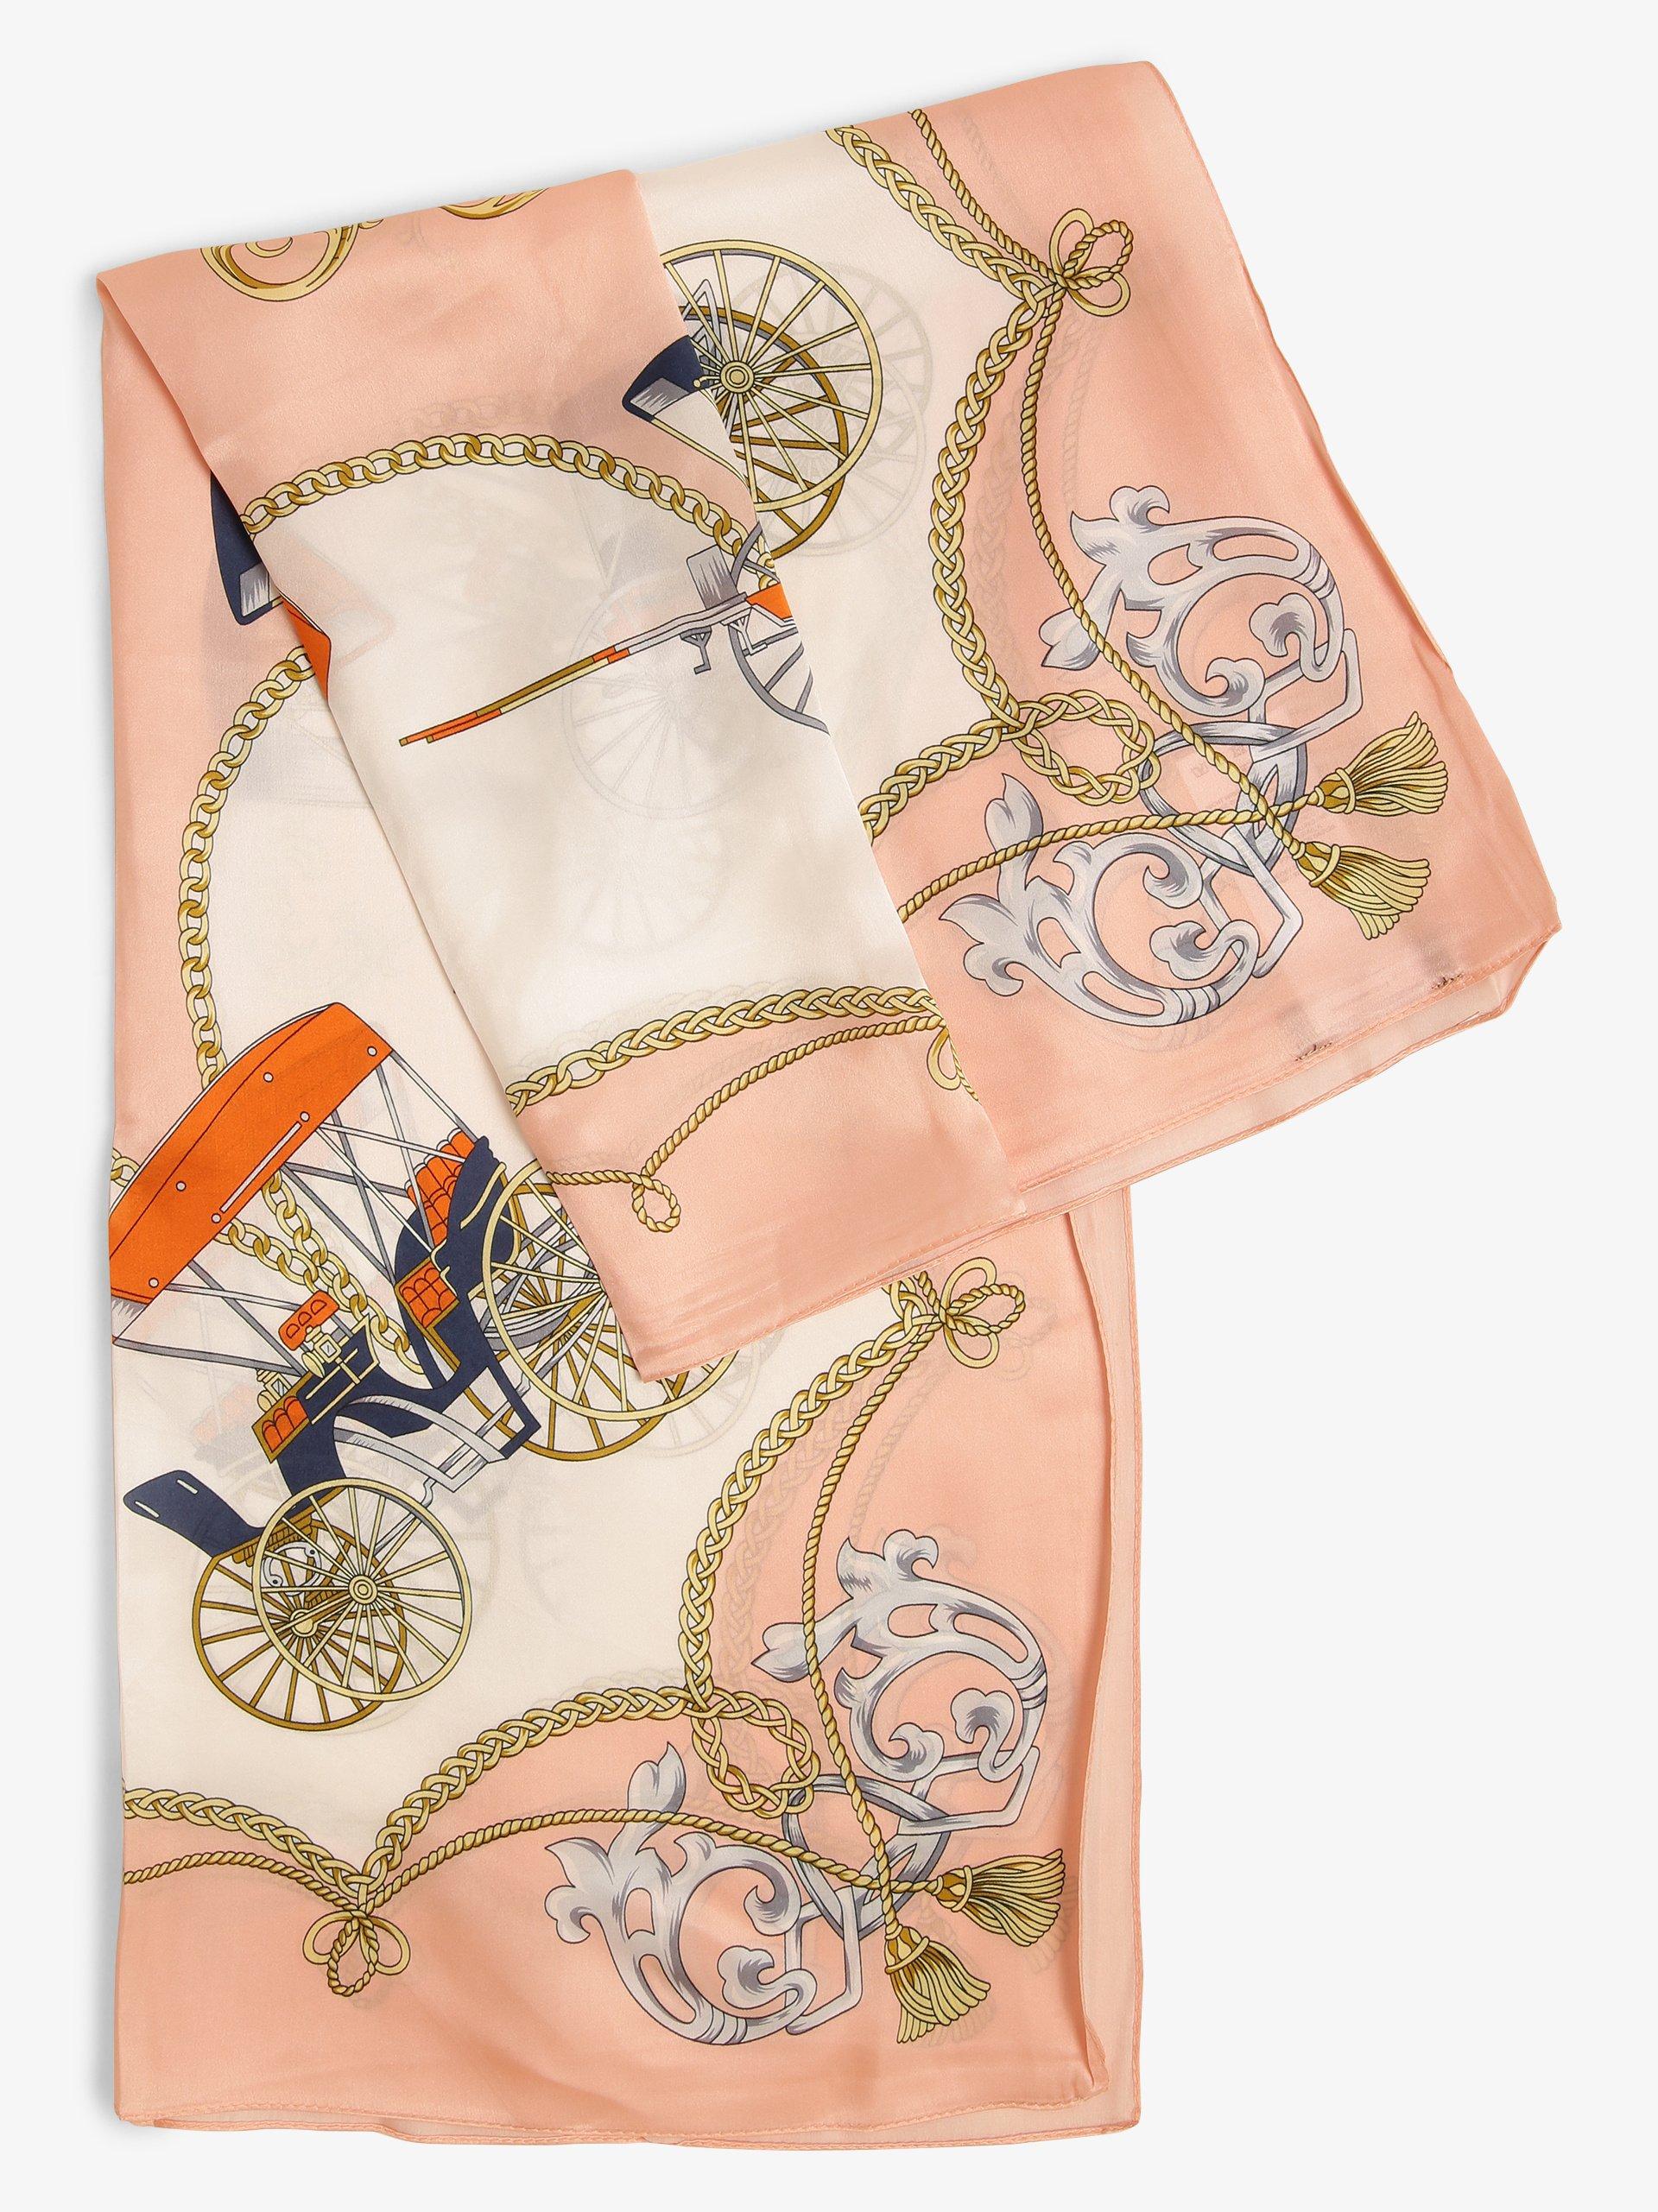 Franco Callegari Damen Tuch aus Seide